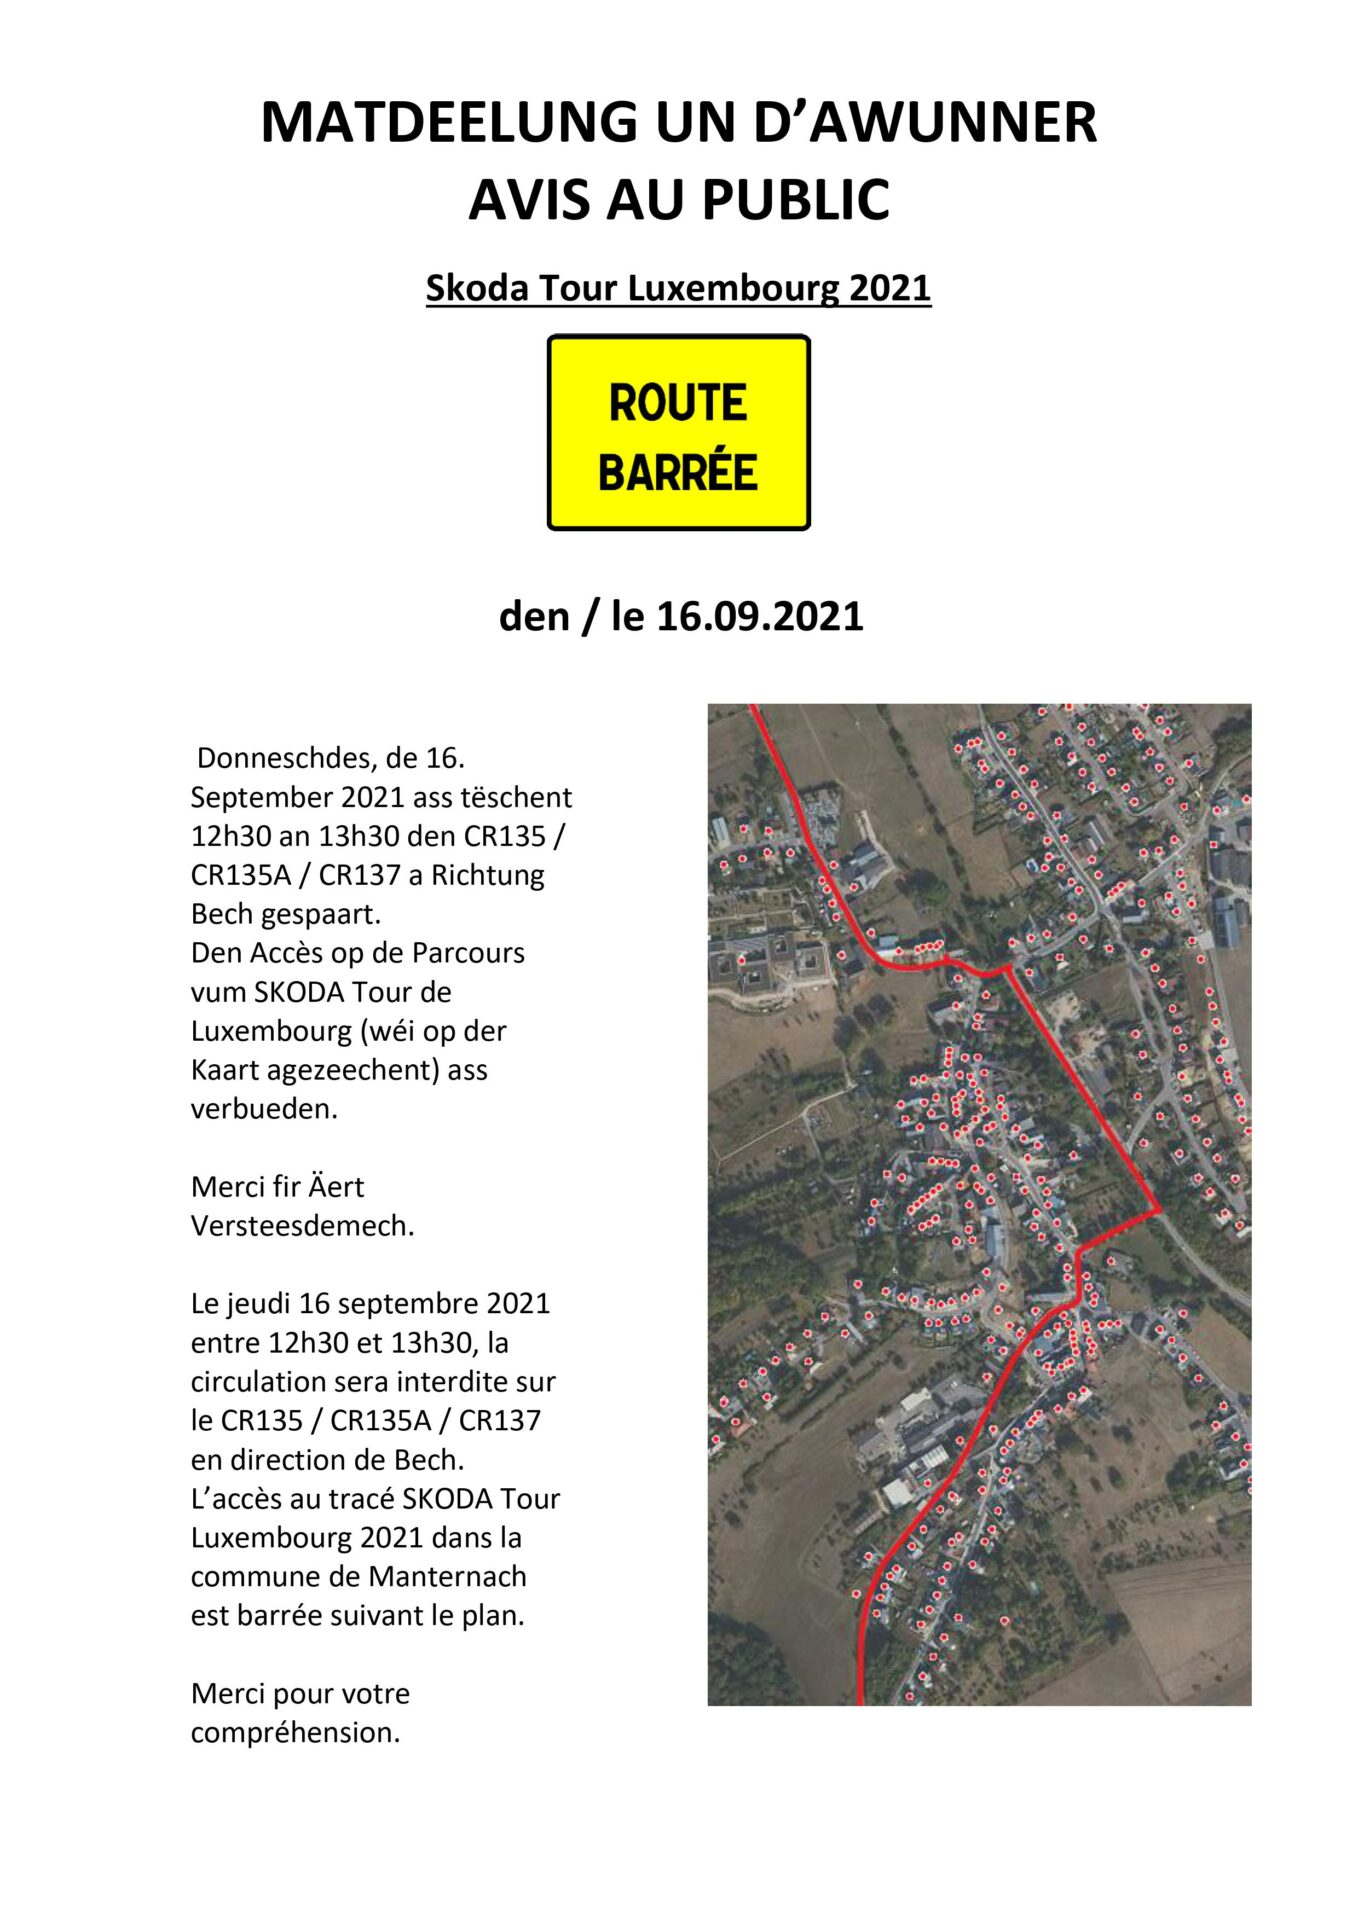 Skoda Tour de Luxembourg